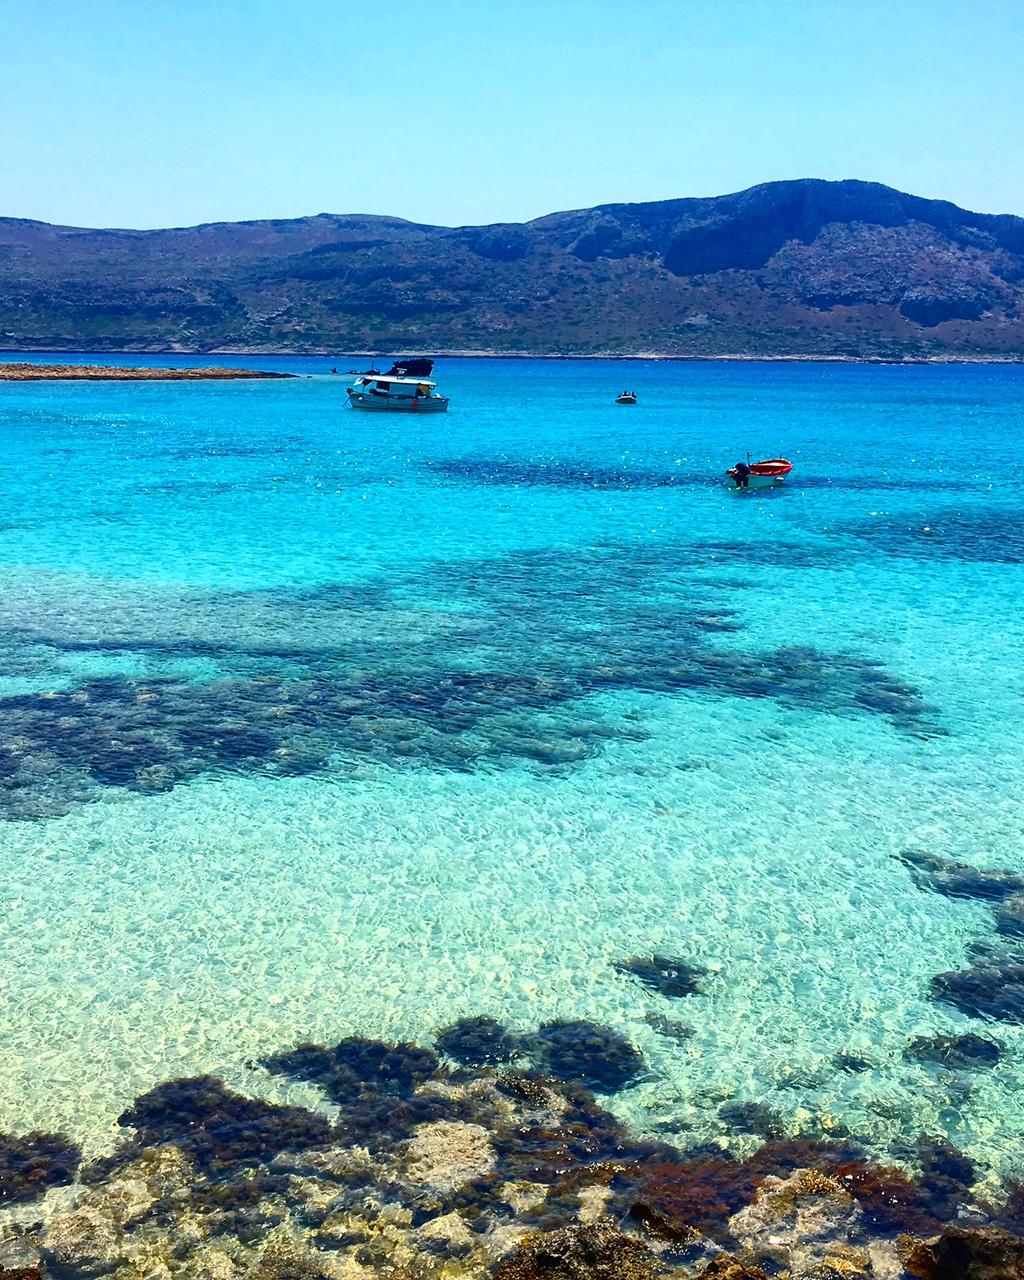 Imeri-Gramvousa1_Crete CRETE- THE BEST OF THE CHANIA REGION